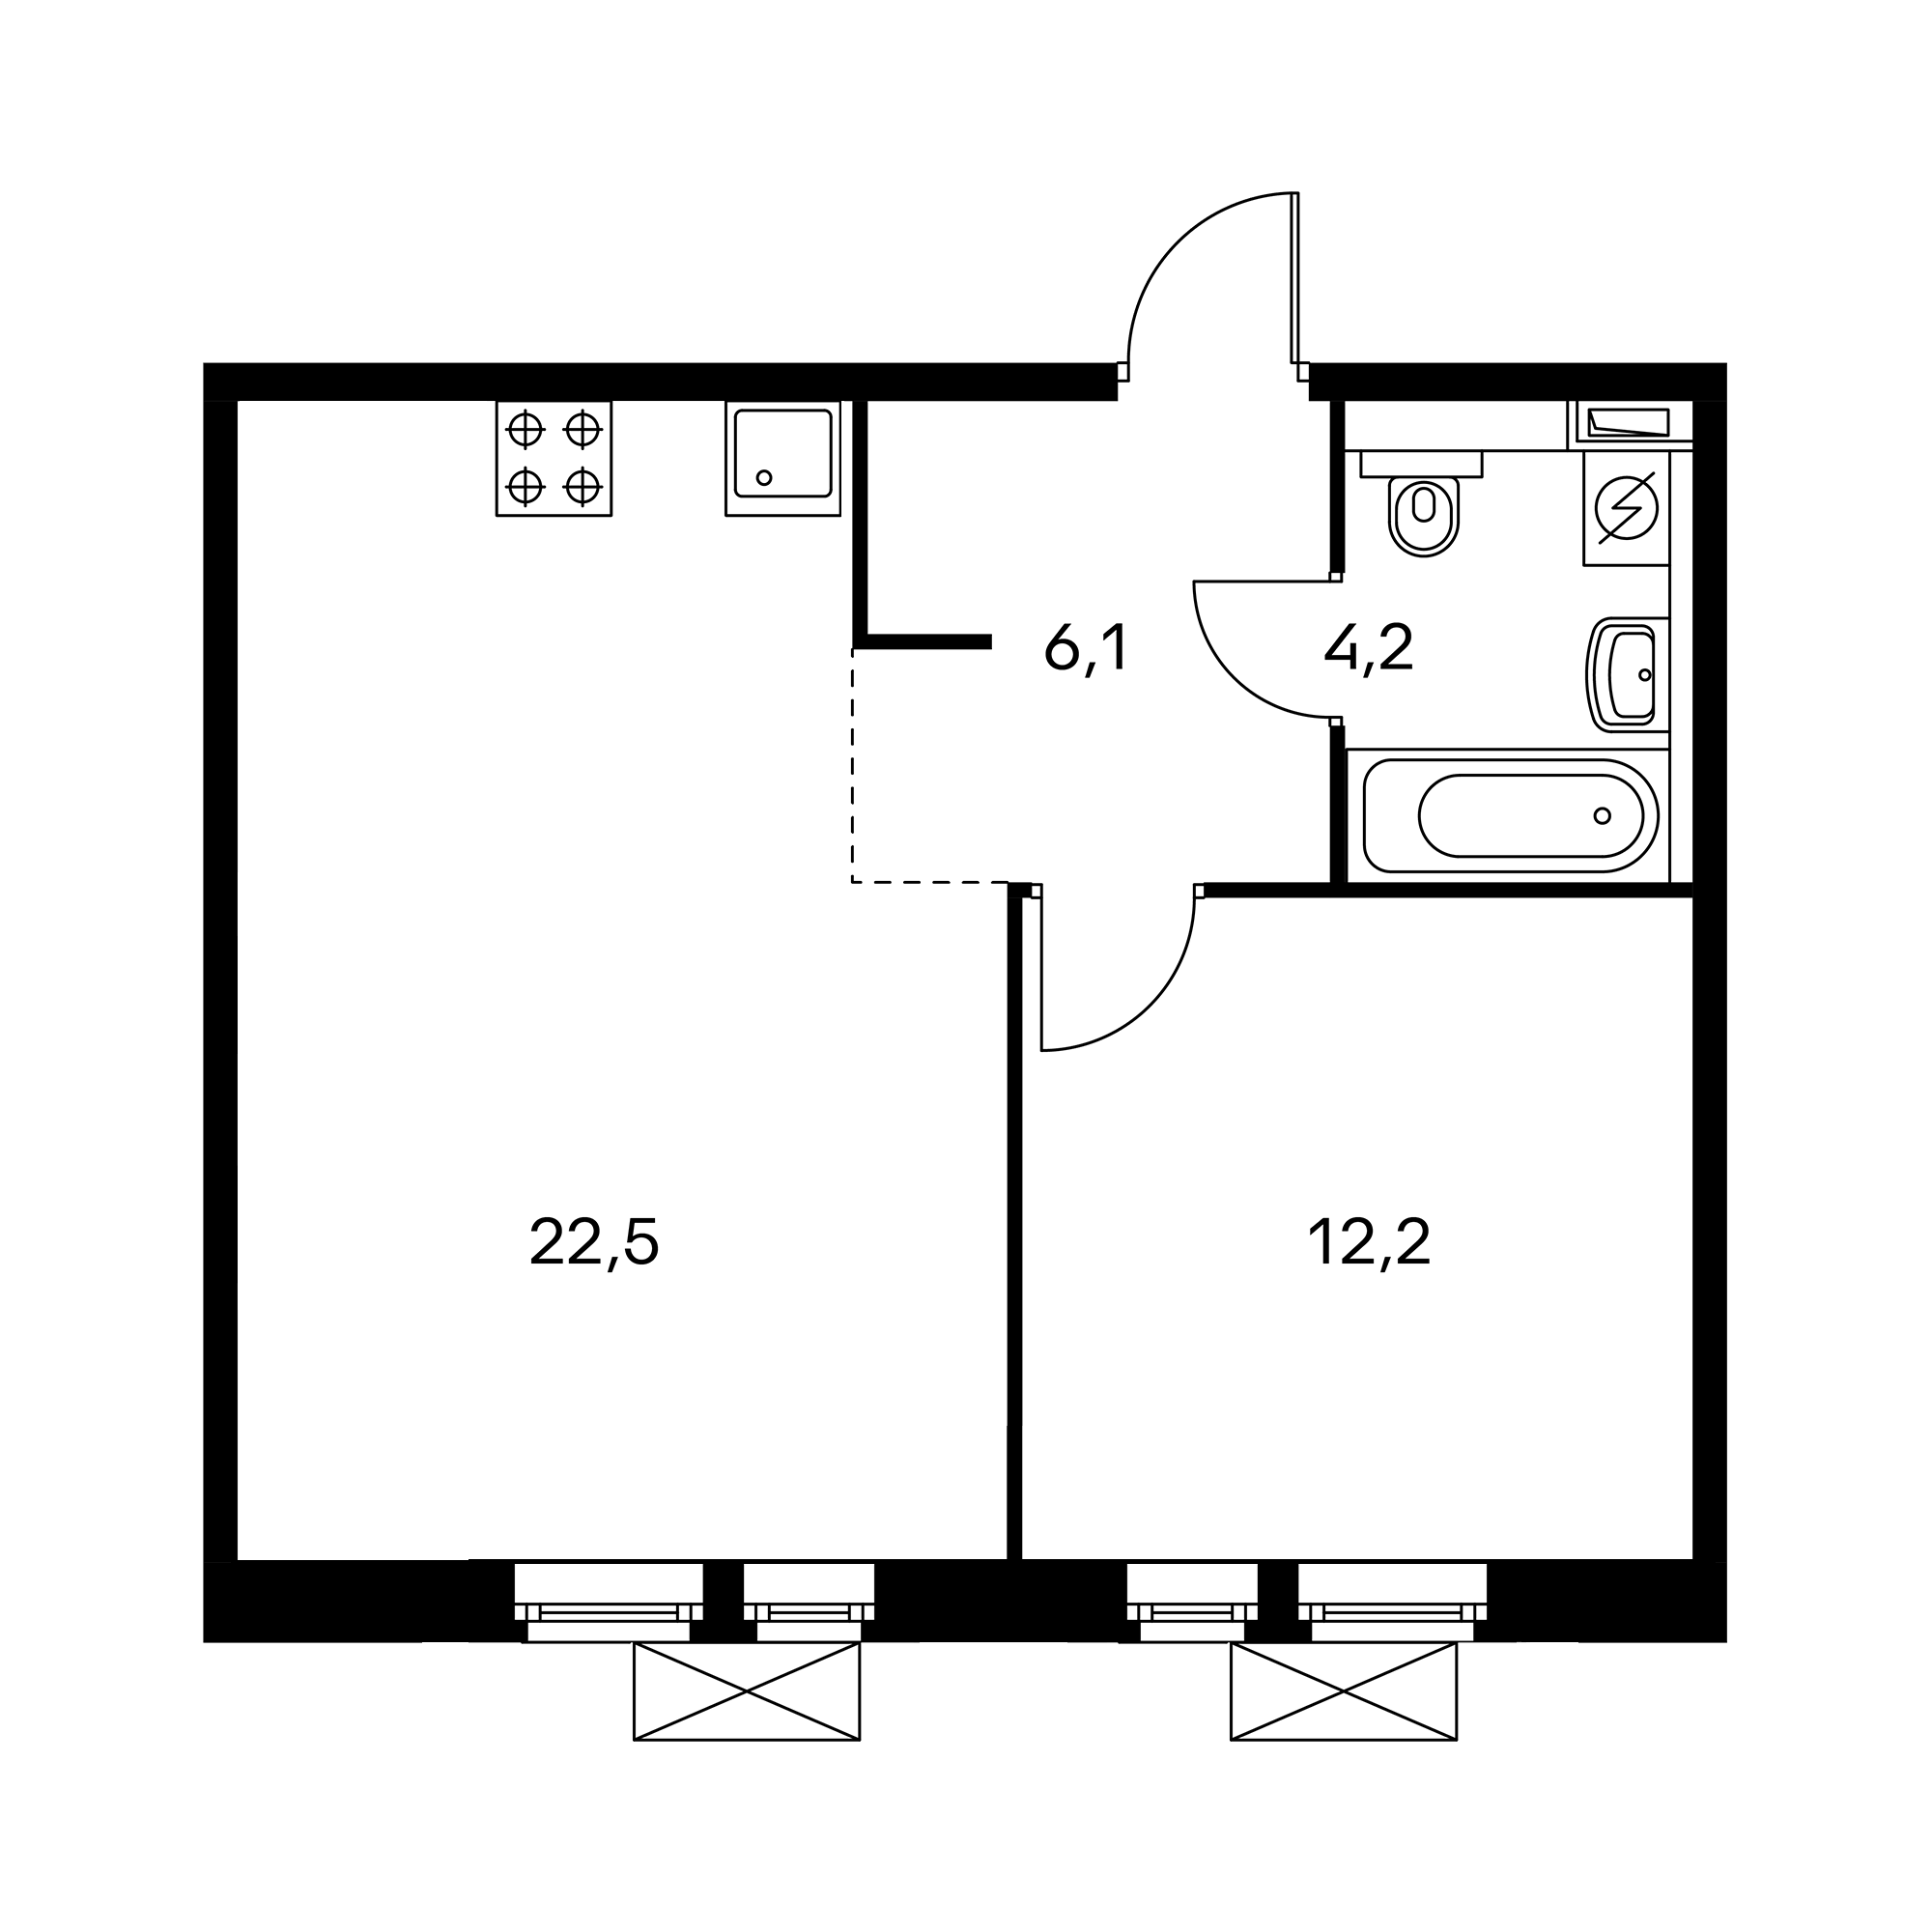 1EL3_7.8-1_1